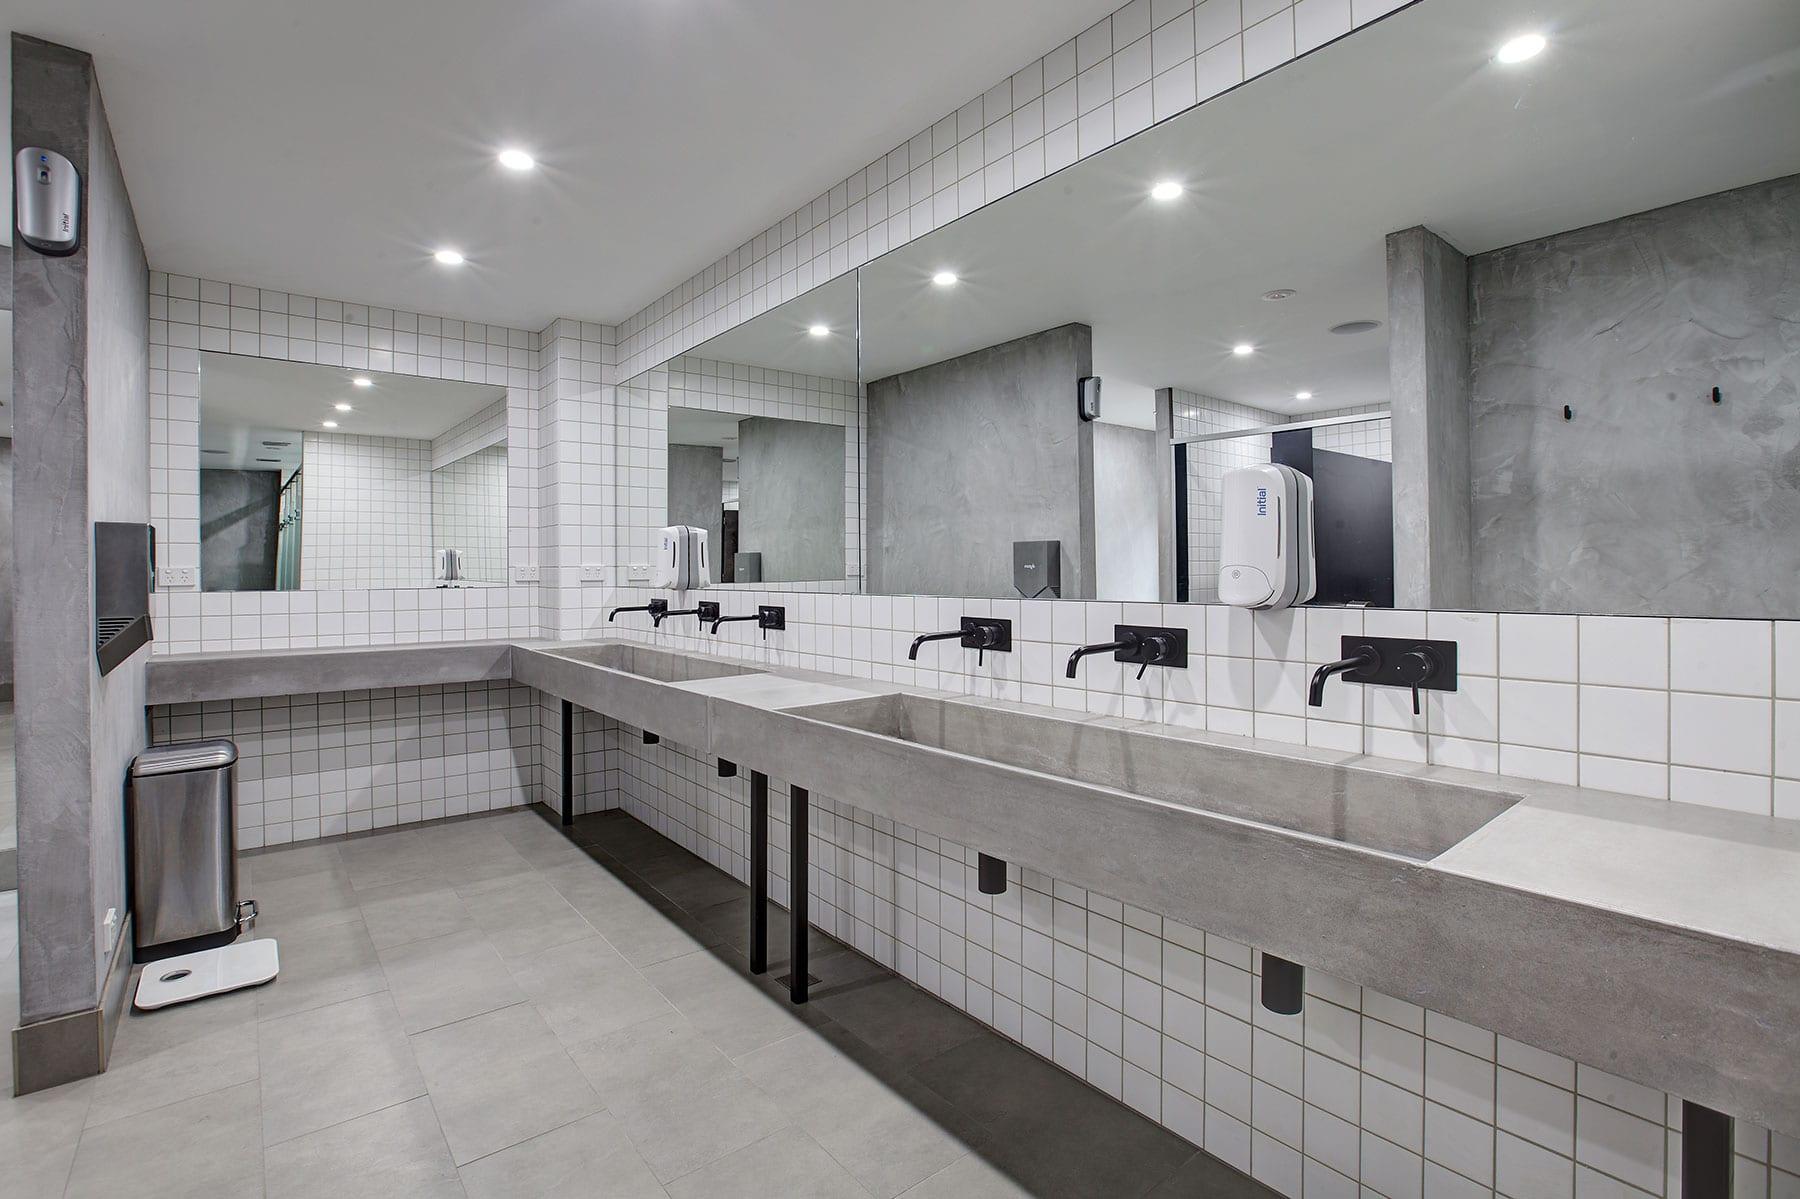 Concrete Ramp Sinks - whole bathroom view - by Concrete Studio